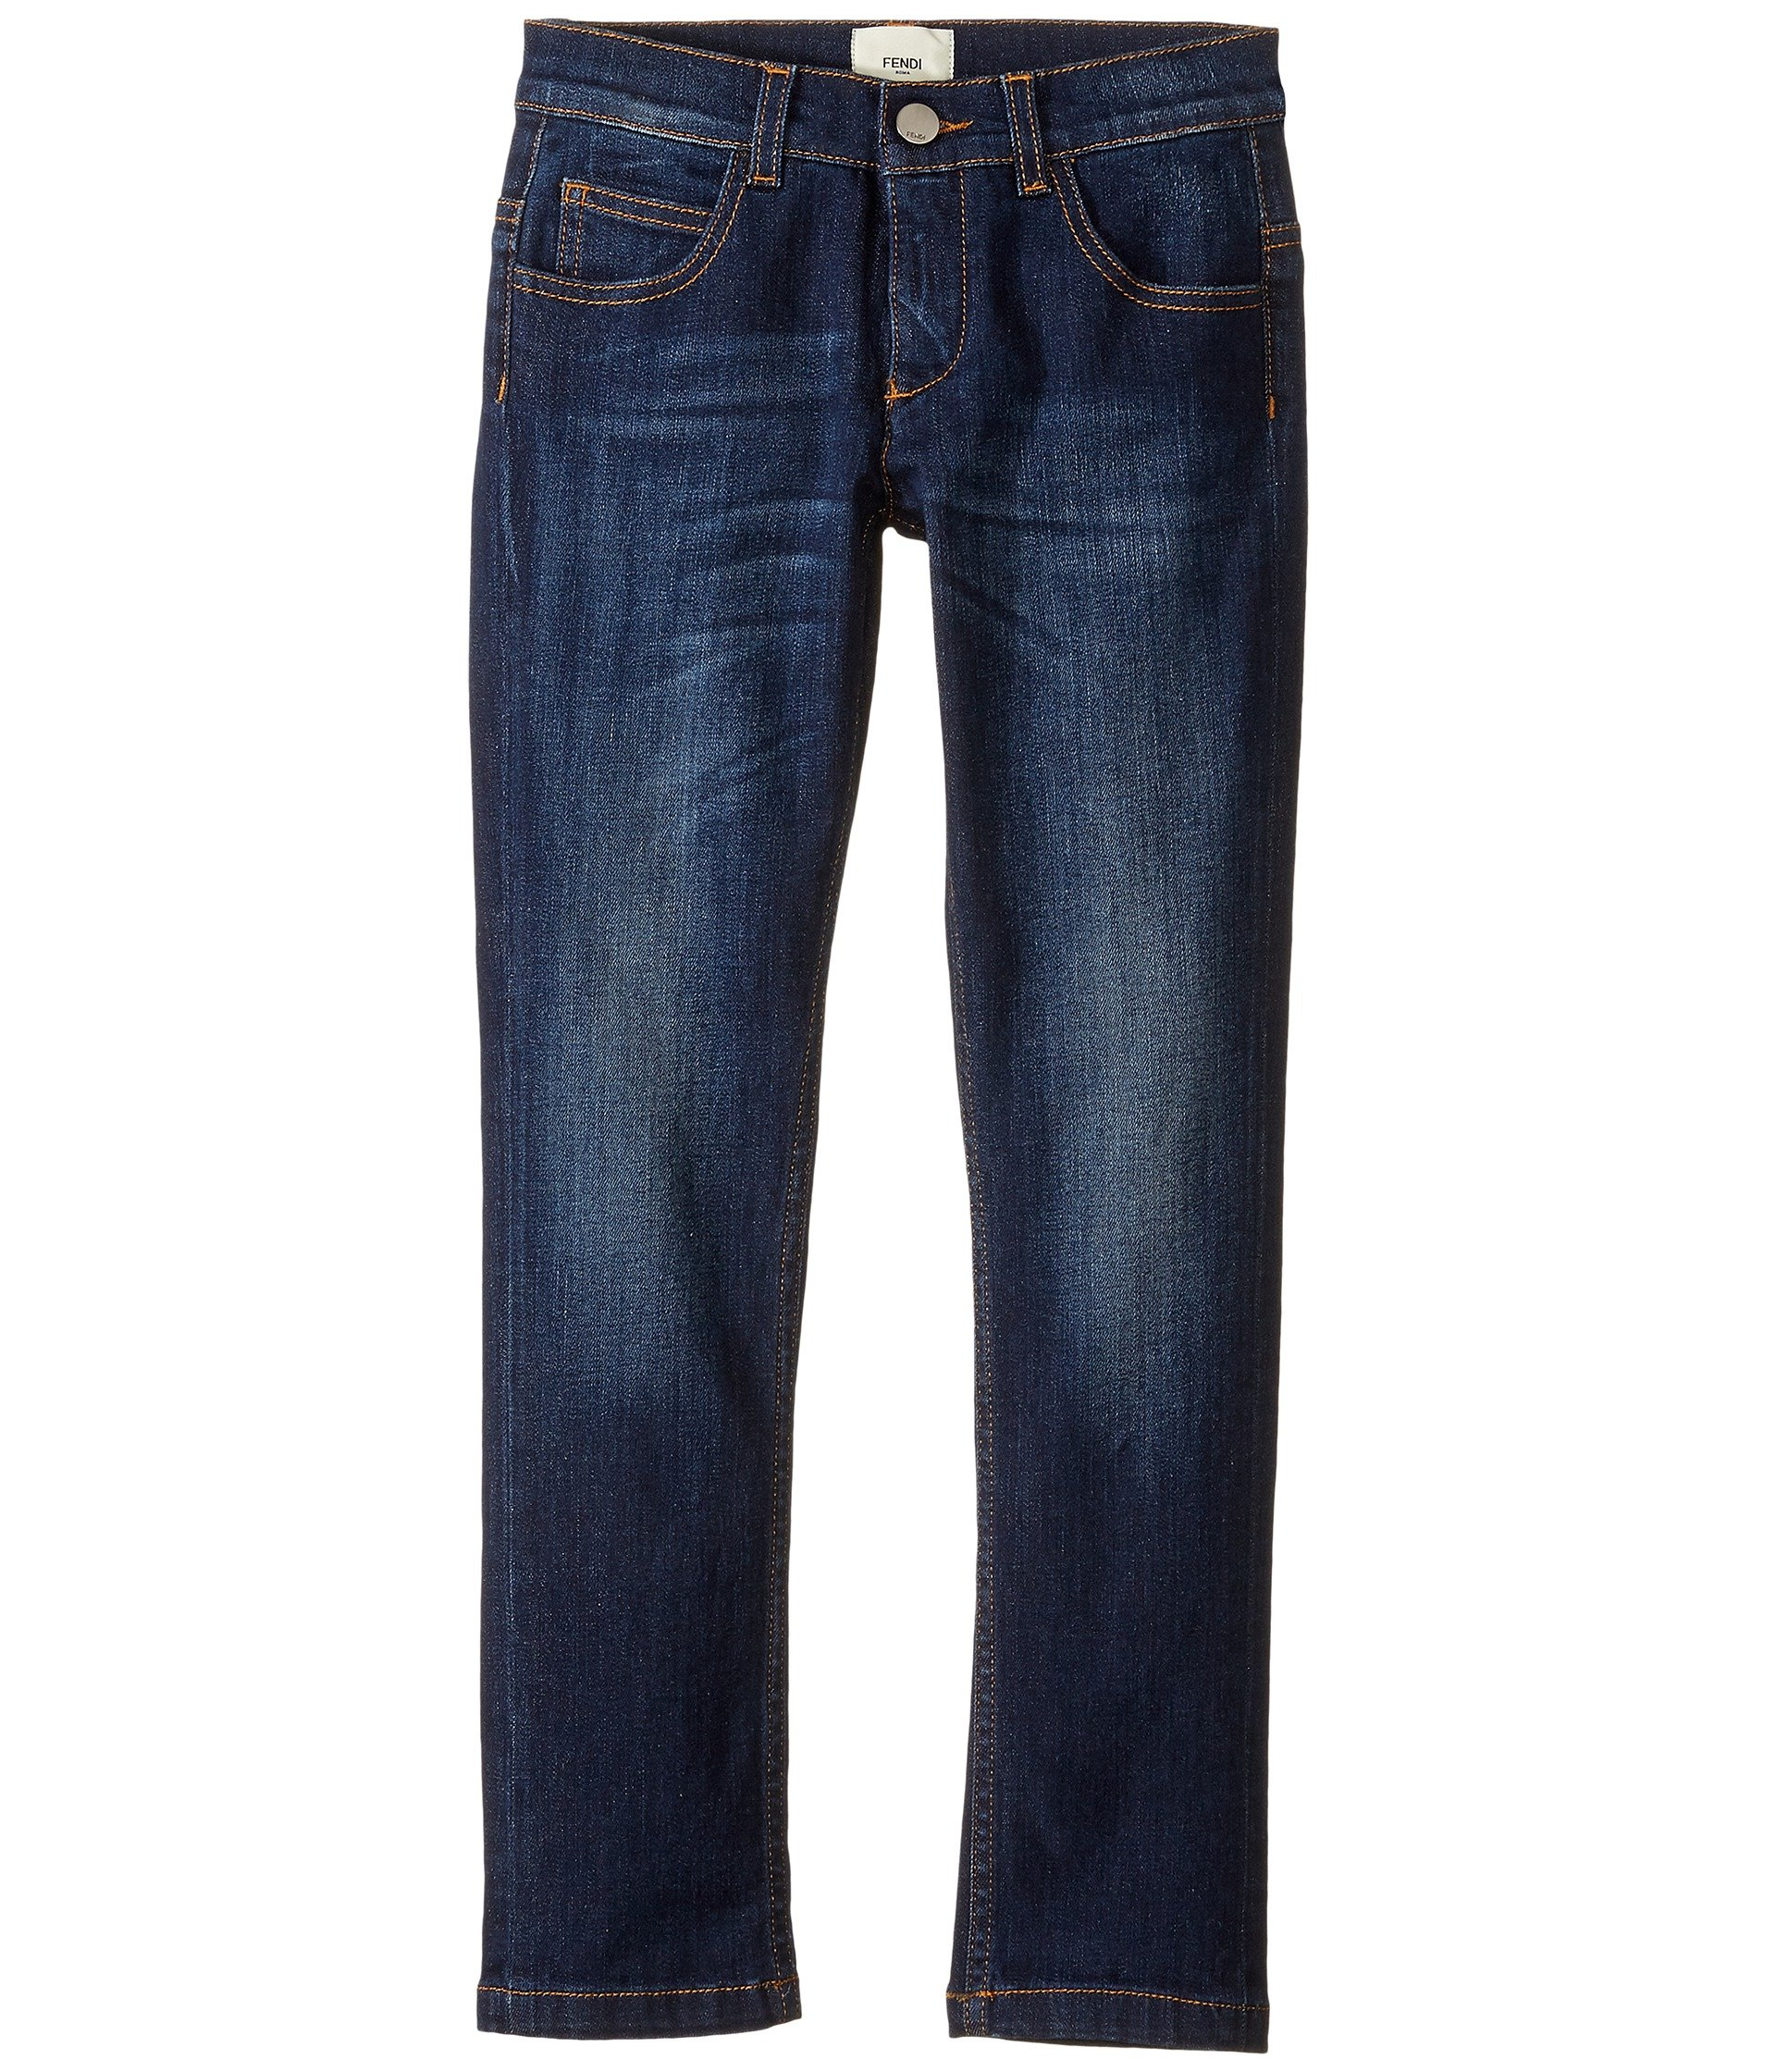 Fendi Kids Boys' Denim Pants With Monster Logo Back Pocket (Little Kids), Blue Denim, 6 Years X One Size